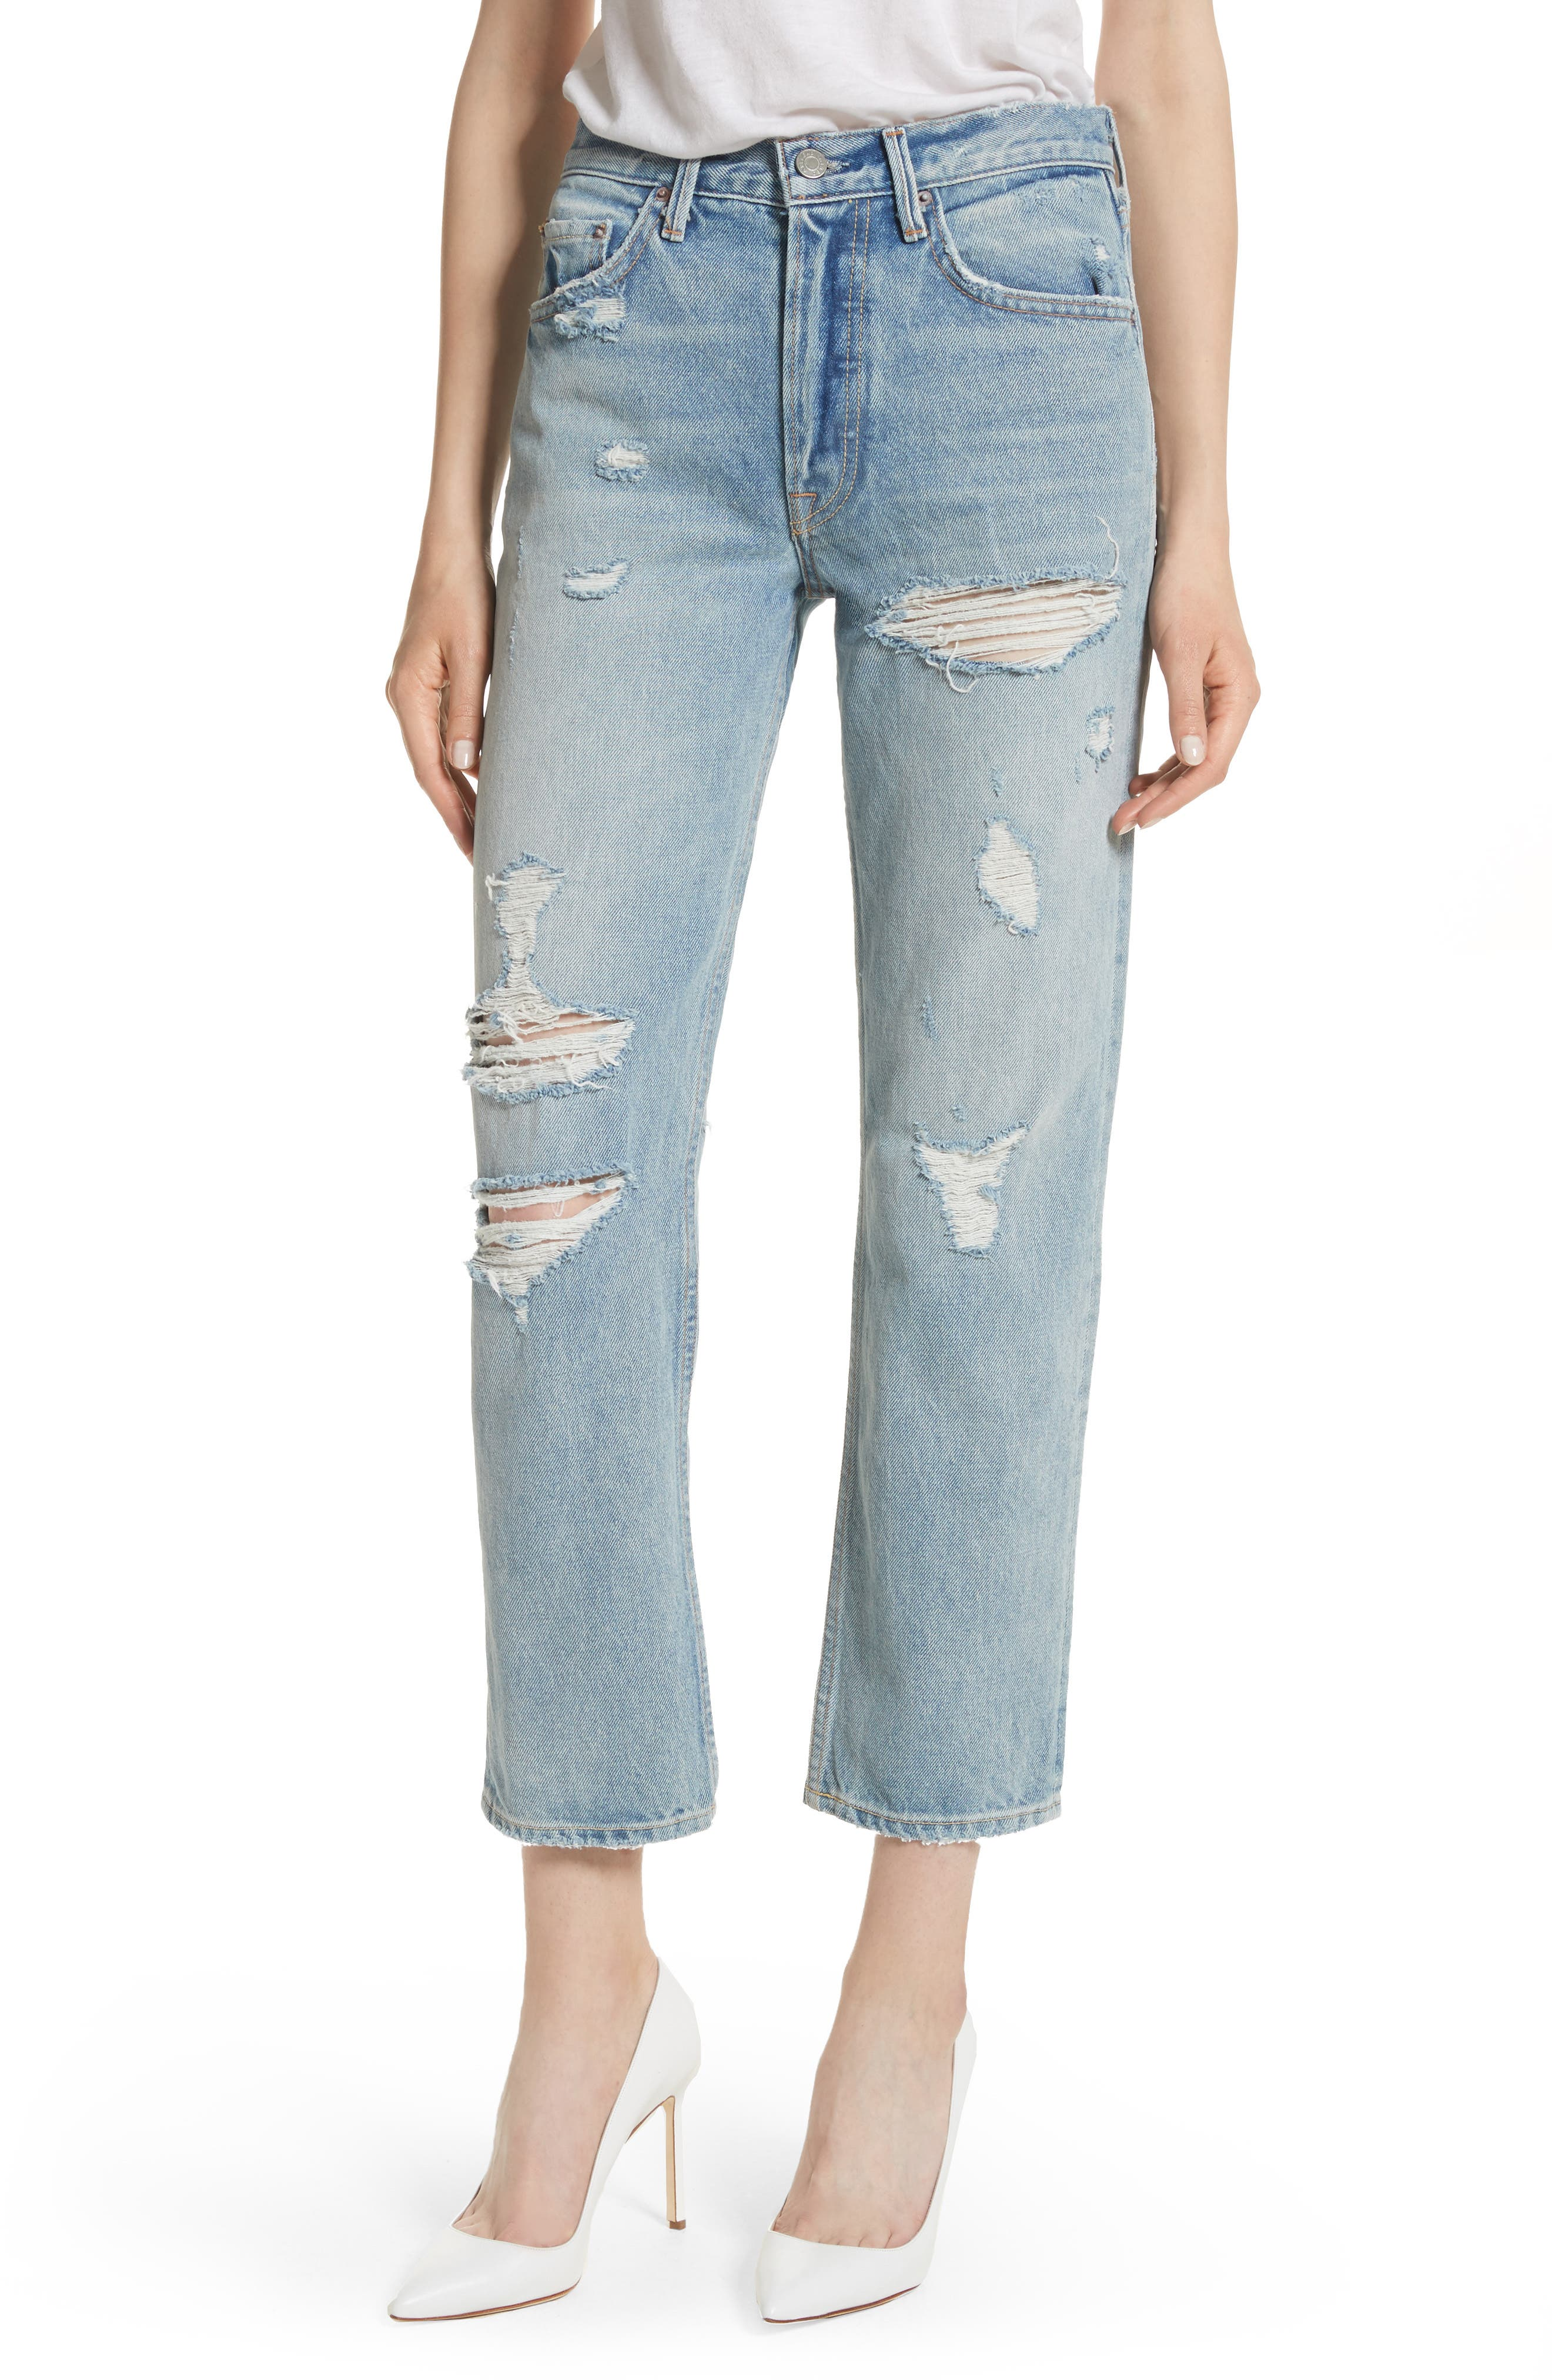 Main Image - GRLFRND Helena Ripped Rigid High Waist Straight Jeans (Reese)